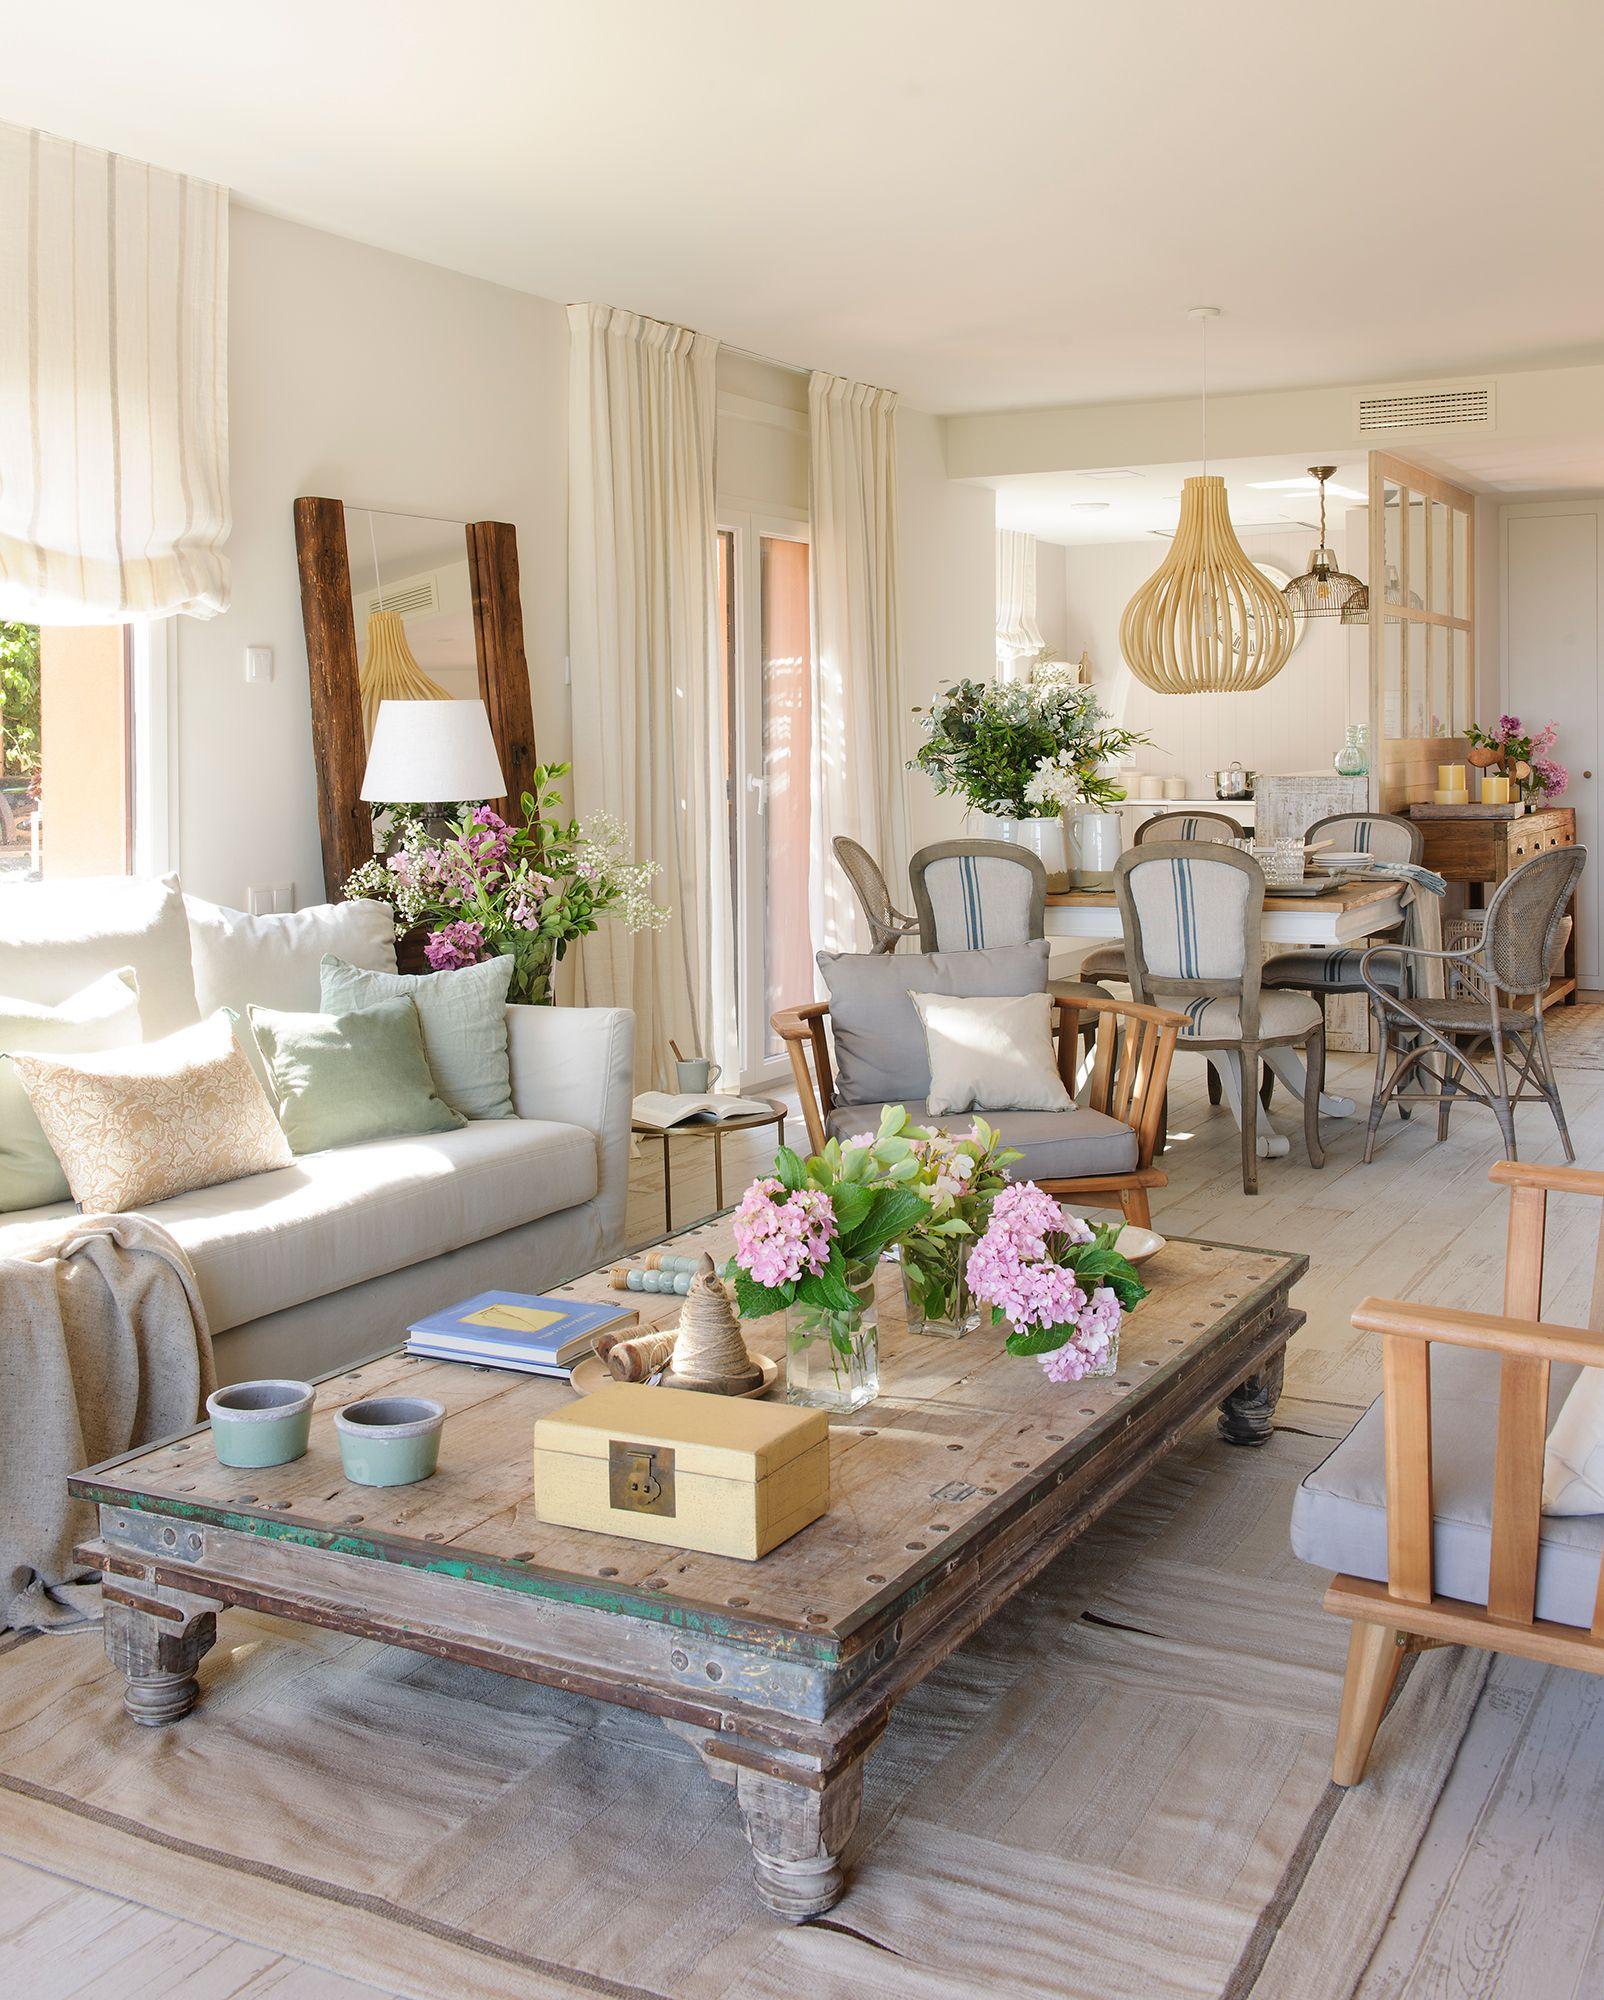 46 Popular Farmhouse Dining Room Design Ideas Trend 2019: White Home Decor, Farmhouse Style Dining Room